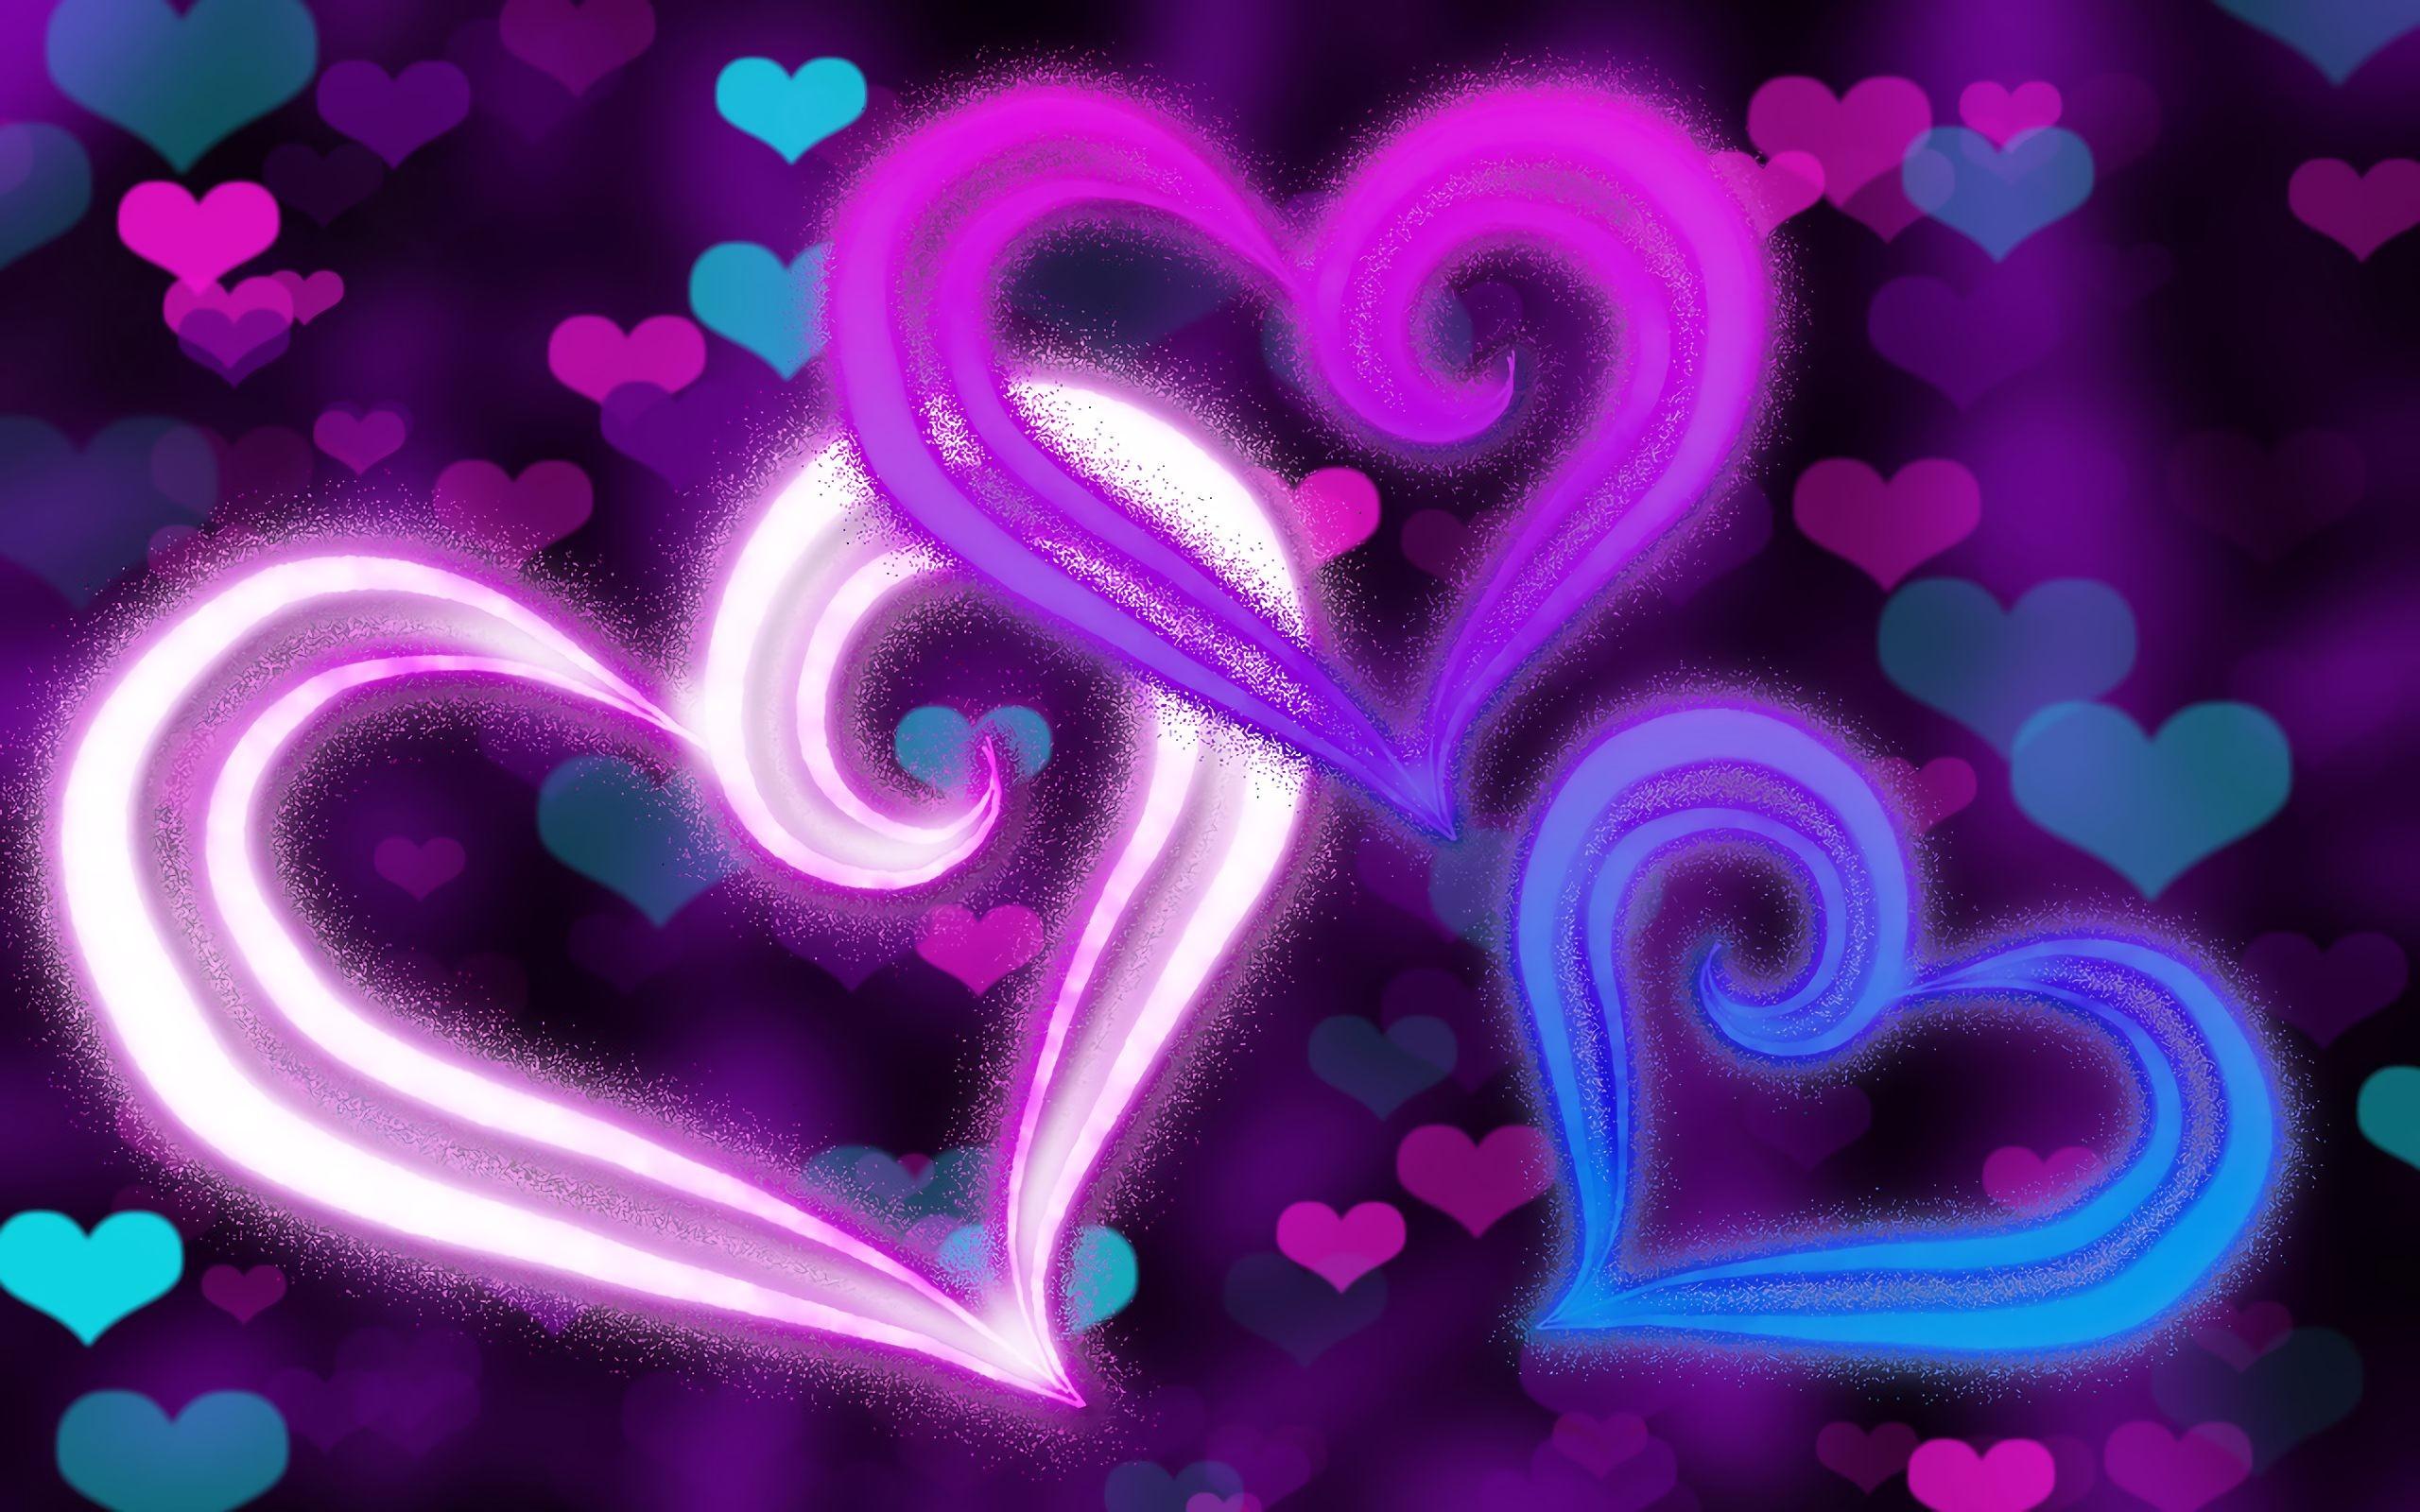 Muoi Firestone: Hearts Wallpapers, Hearts Wallpapers | Desktop-Screens  Graphics